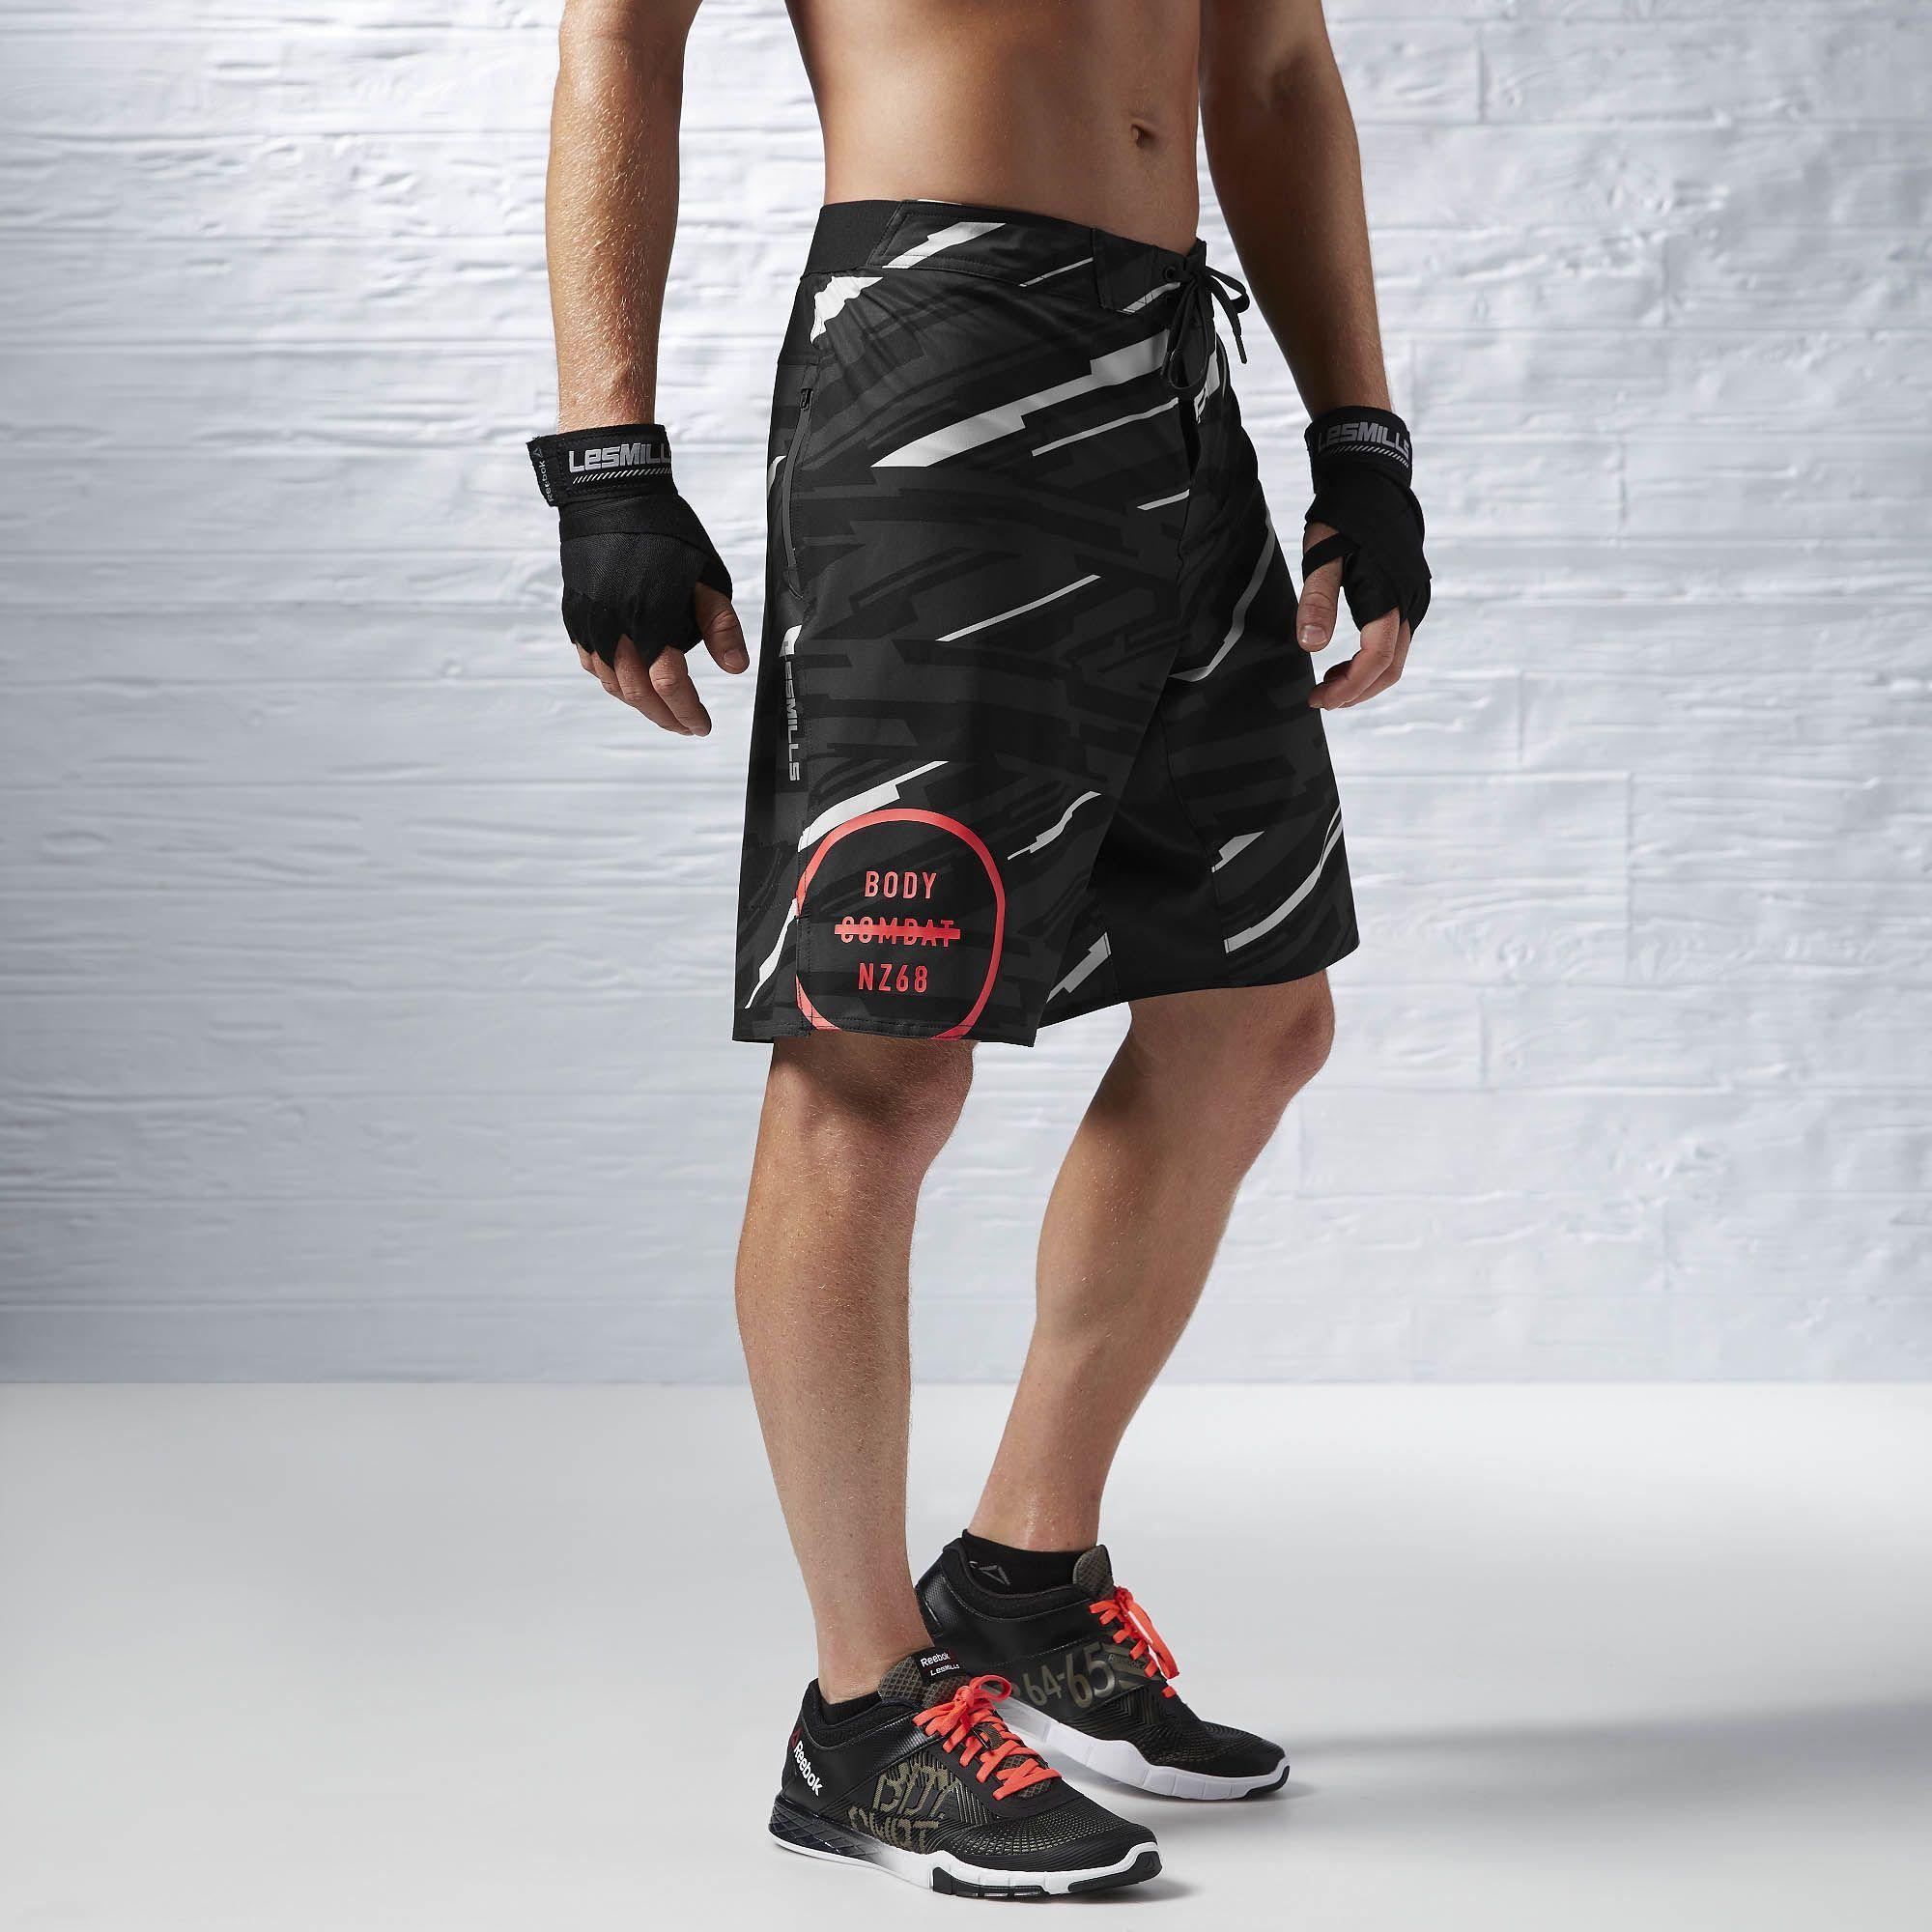 Black Gym Wear & Gym Trainers | Reebok Official Shop. Black ReebokLes MillsBody  ...